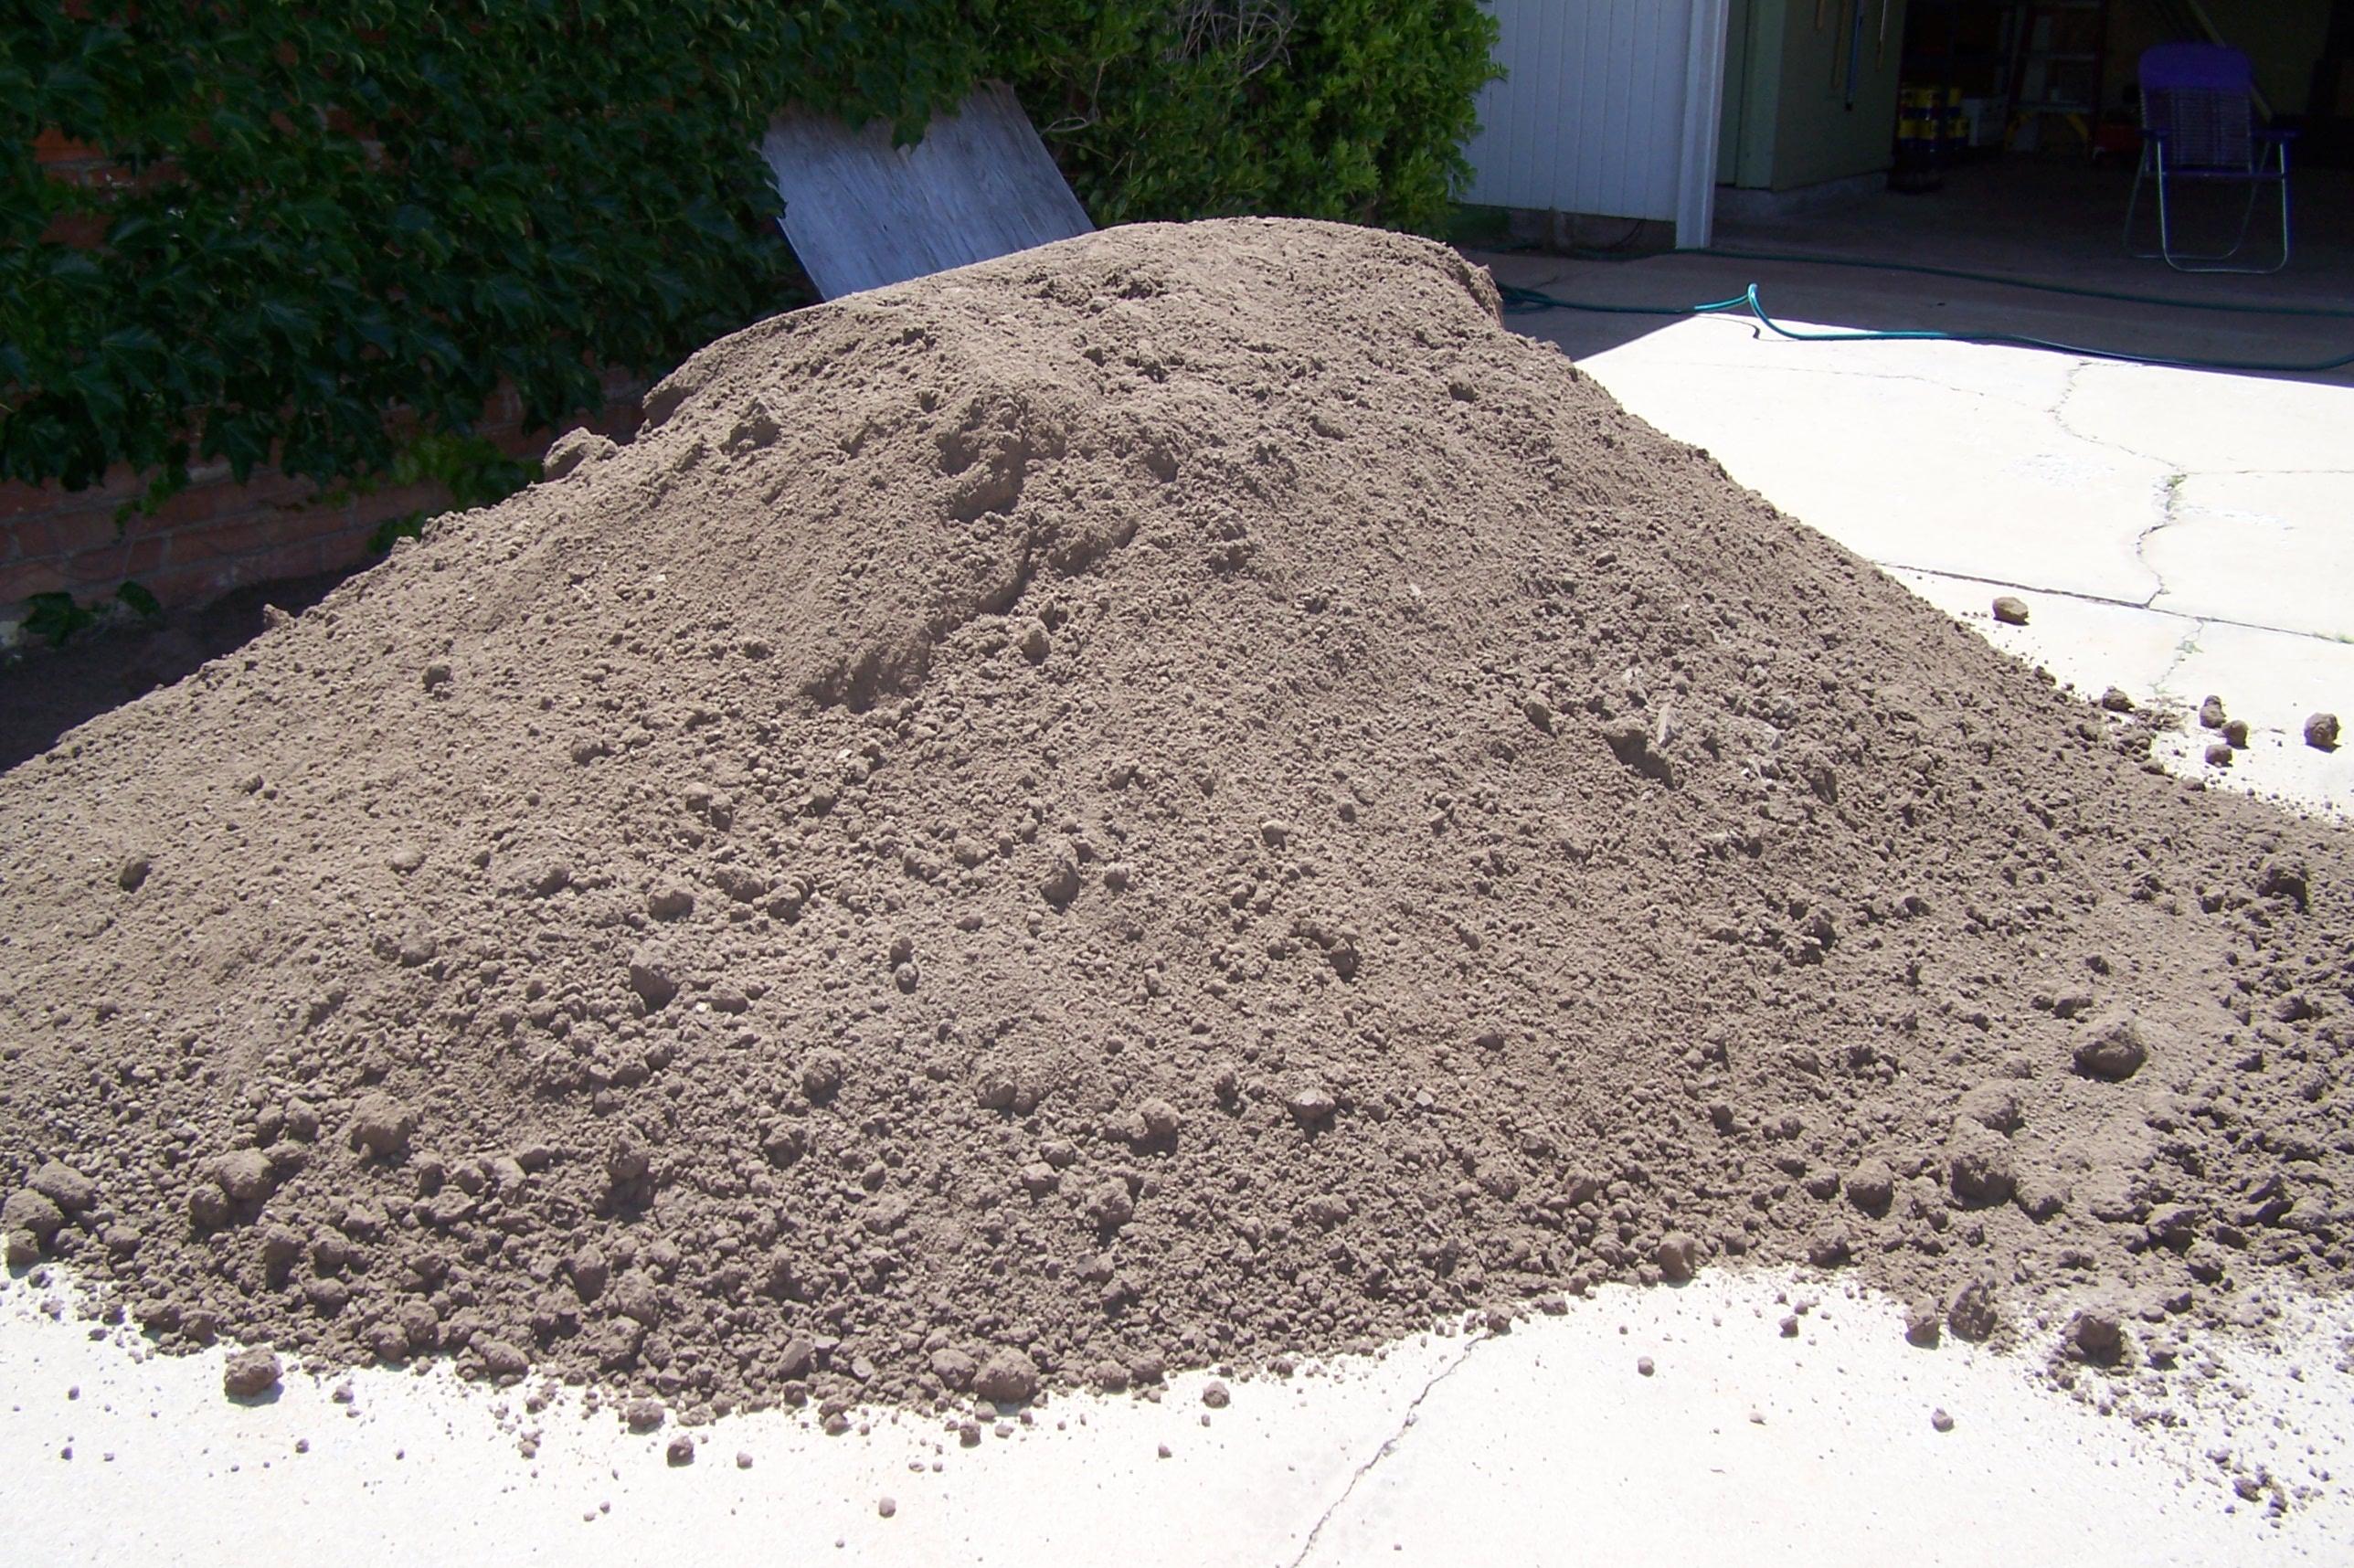 Pile of Dirt, Brown, Dirt, Earth, Pile, HQ Photo